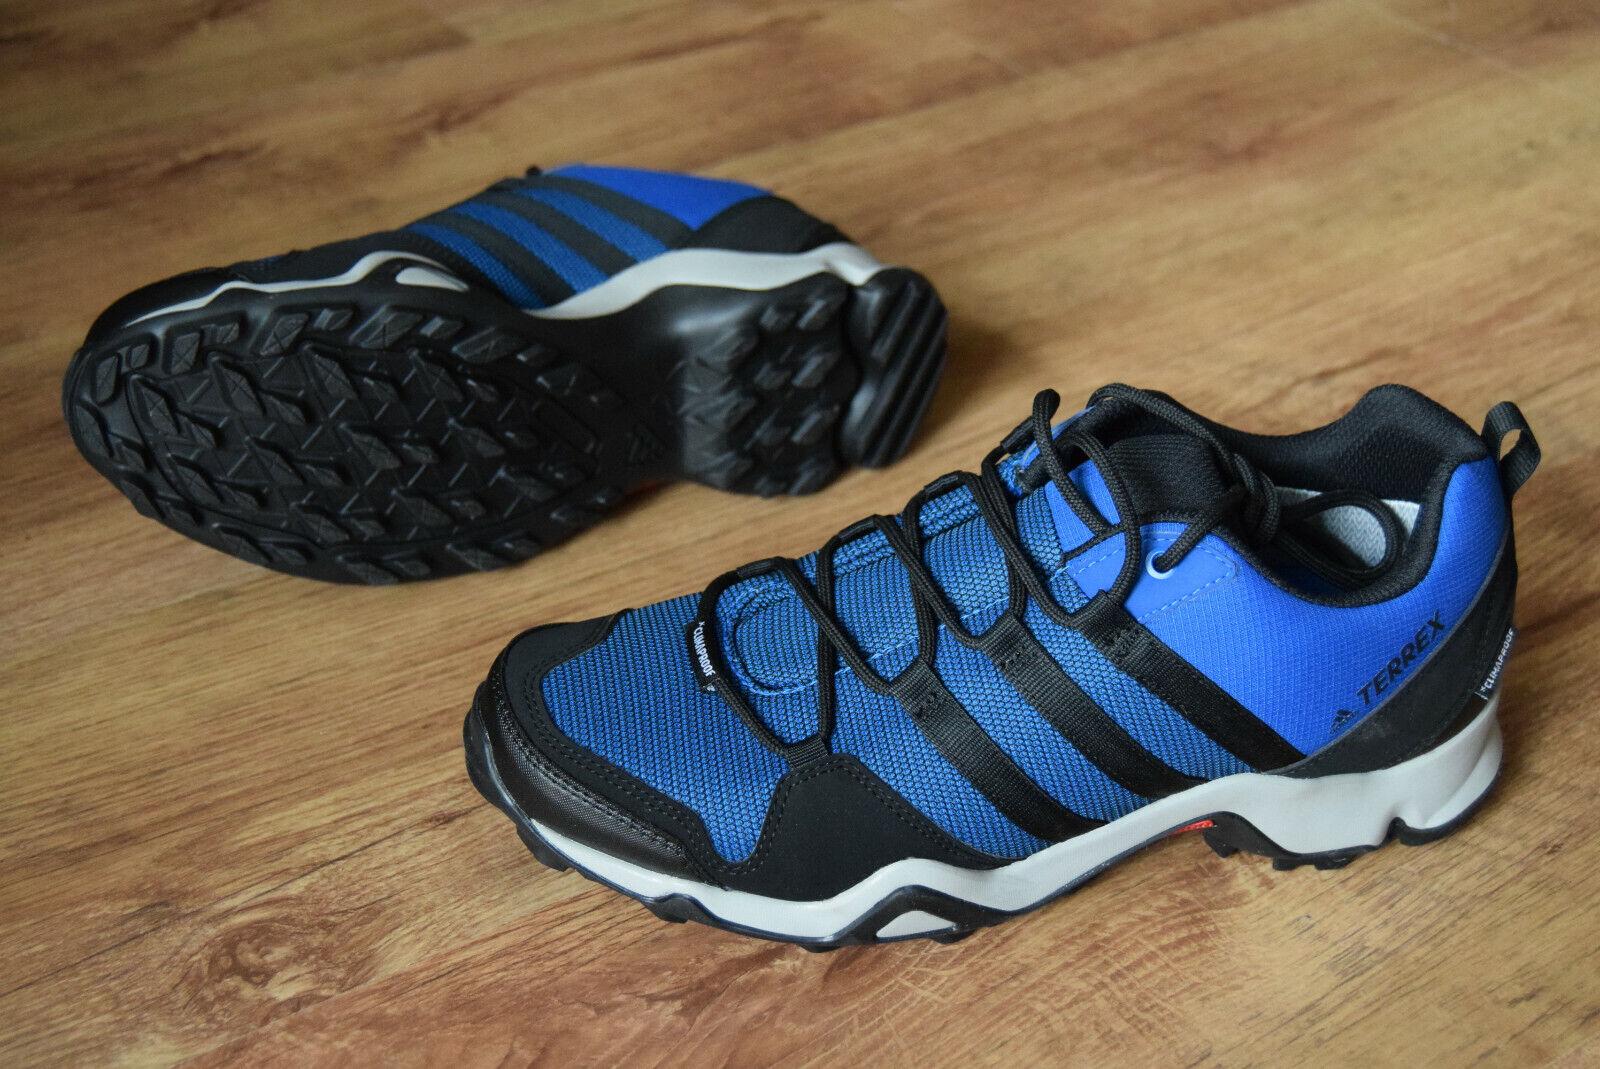 Adidas Adidas Adidas Terrex AX2 CP 40 42 42,5 43 44 CM7472 Sautoponi da Trekre Veloce R2 GTX 910